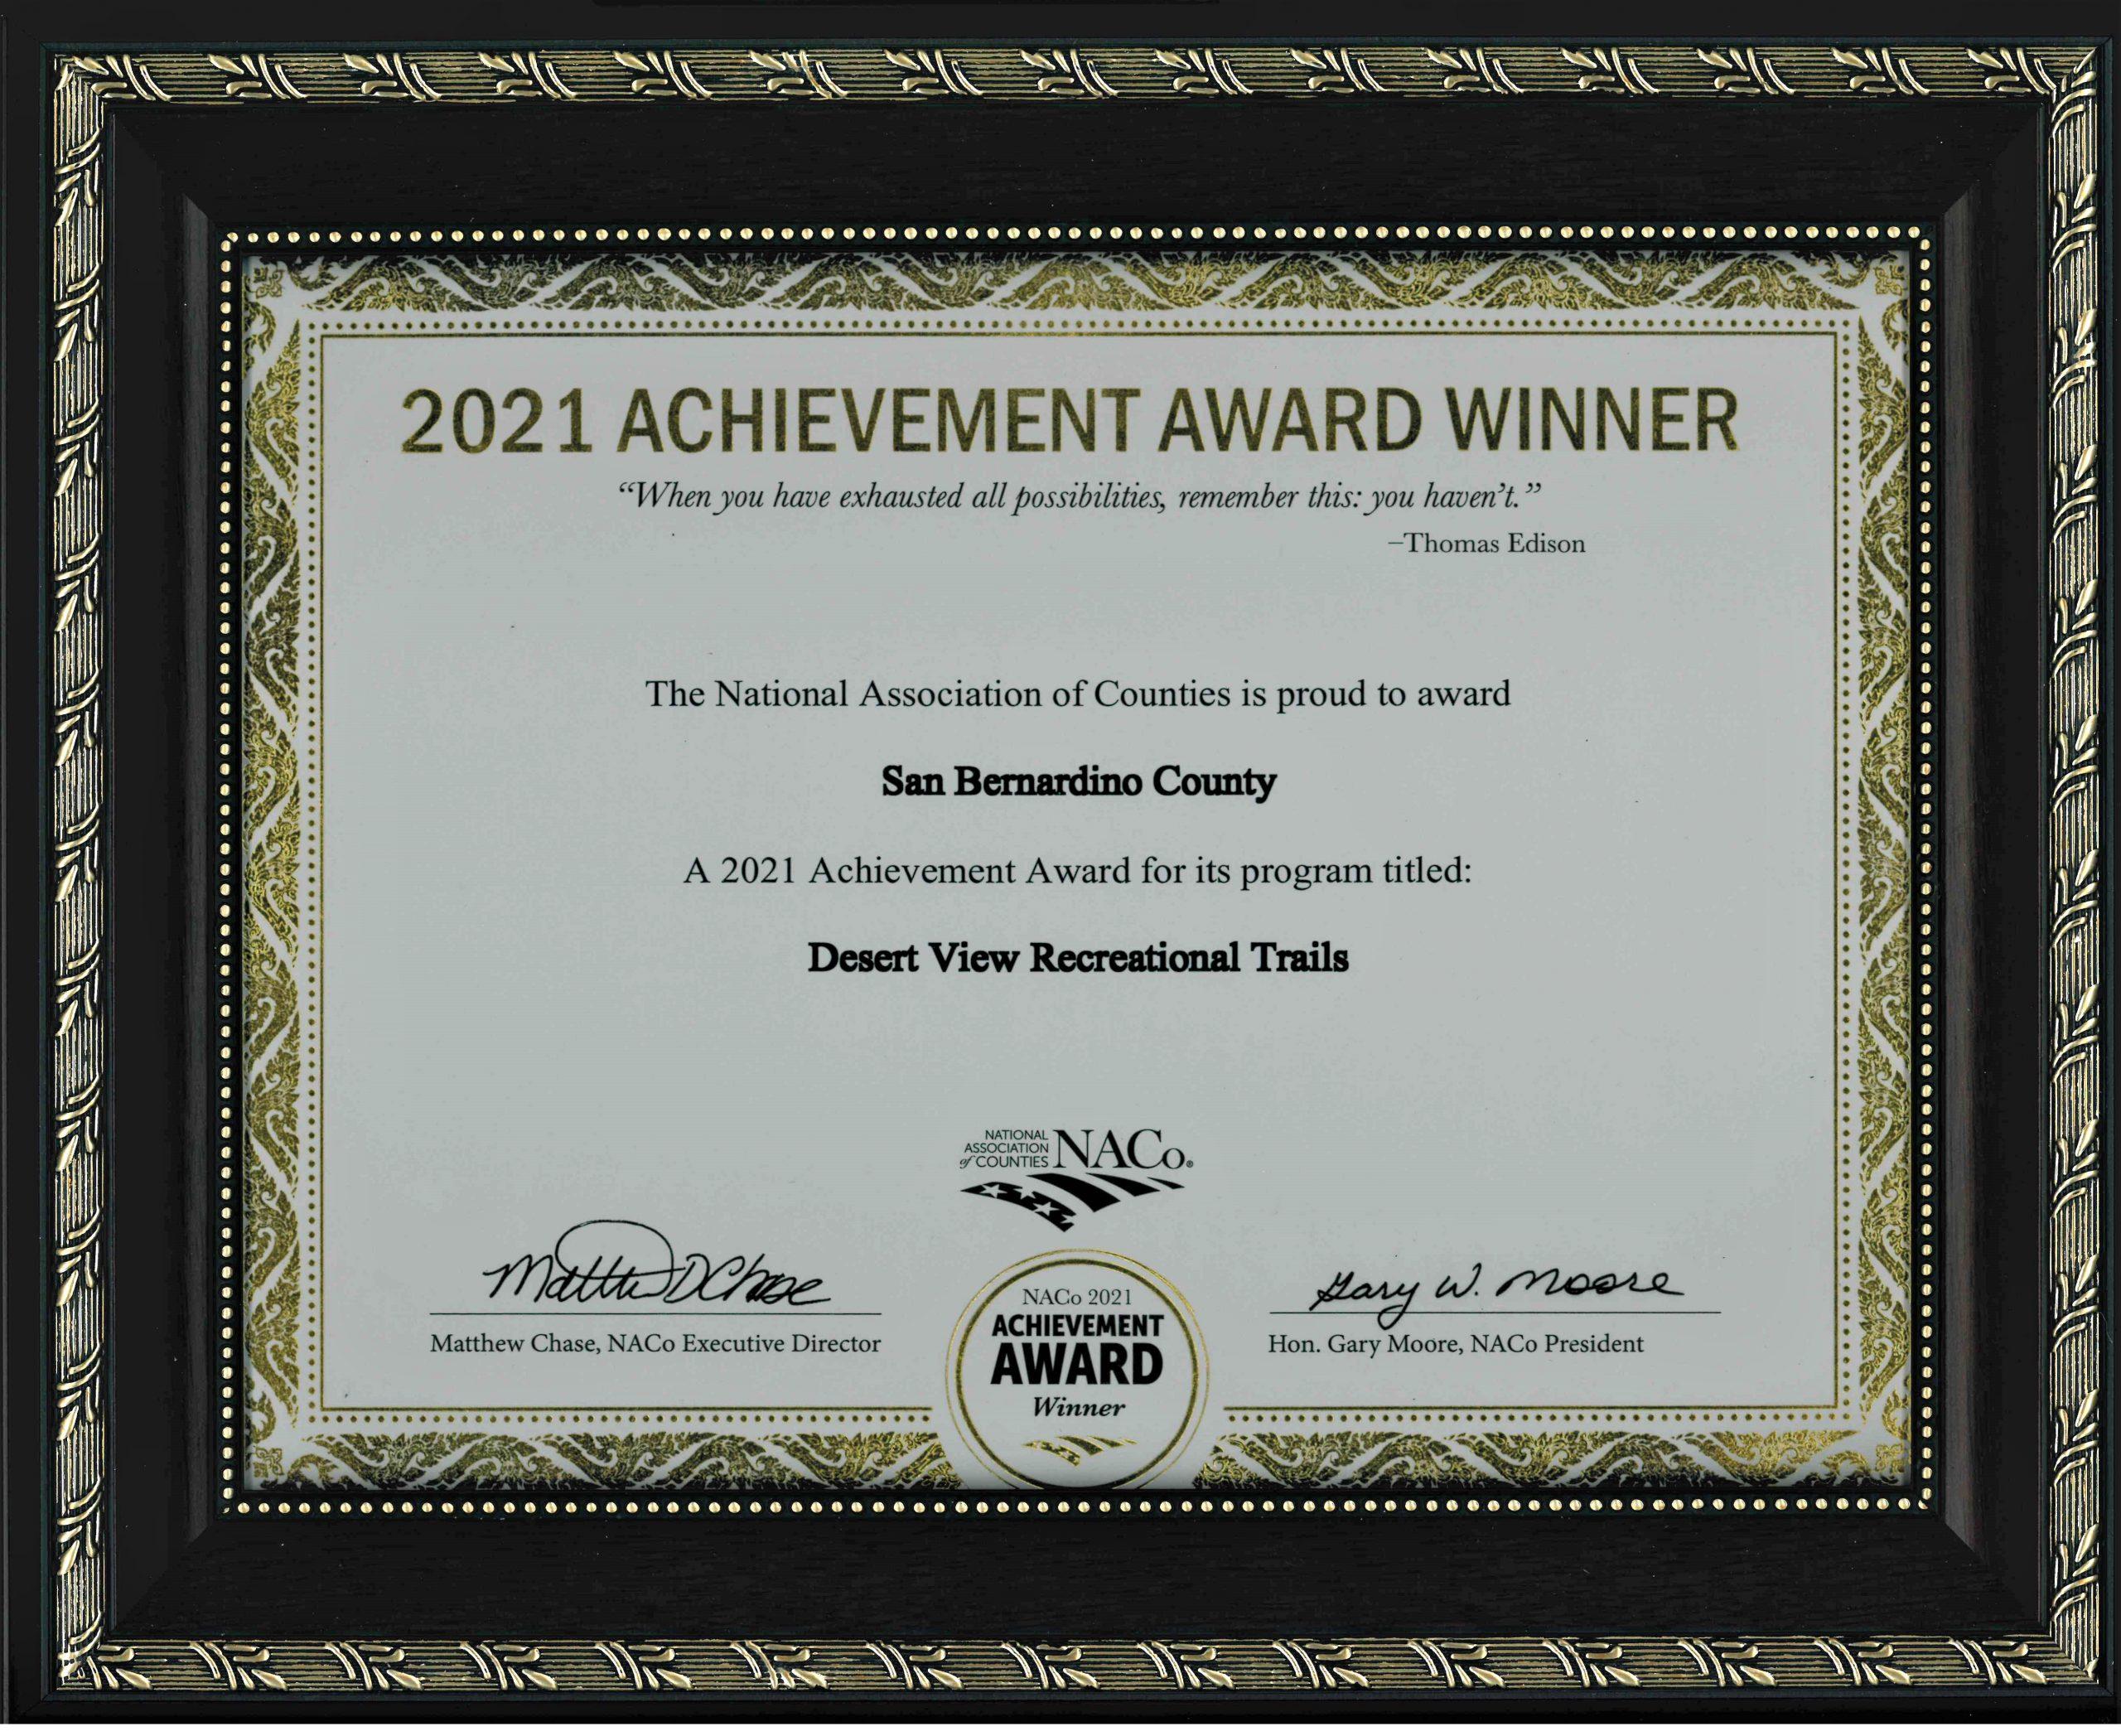 2021 NACO Achievement Award Plaque